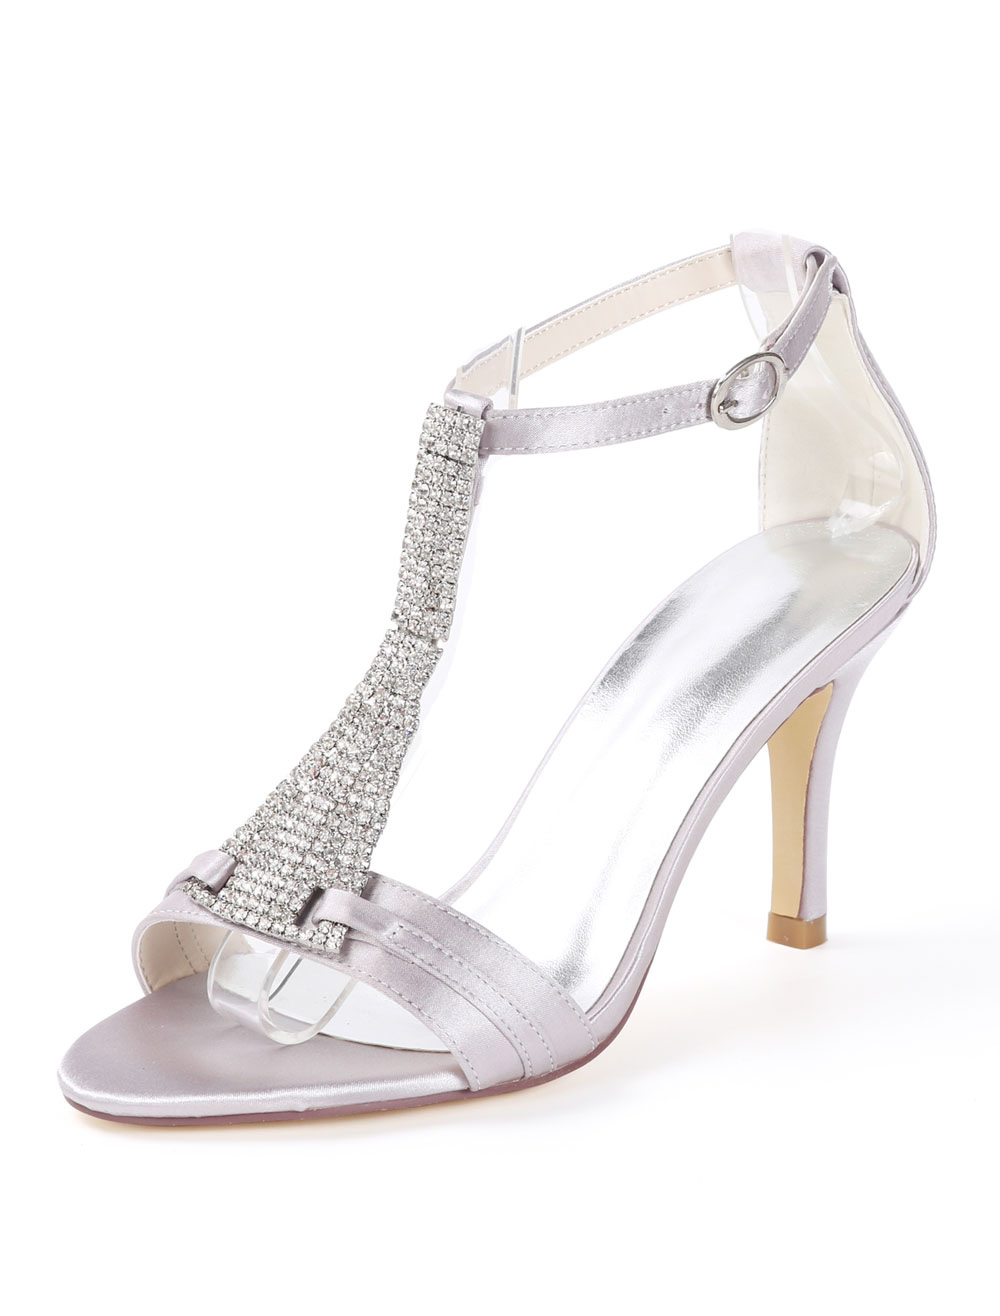 bc86ef158 الساتان حذاء الزفاف الأبيض المفتوحة تو أحجار الراين T نوع خمر أحذية ...